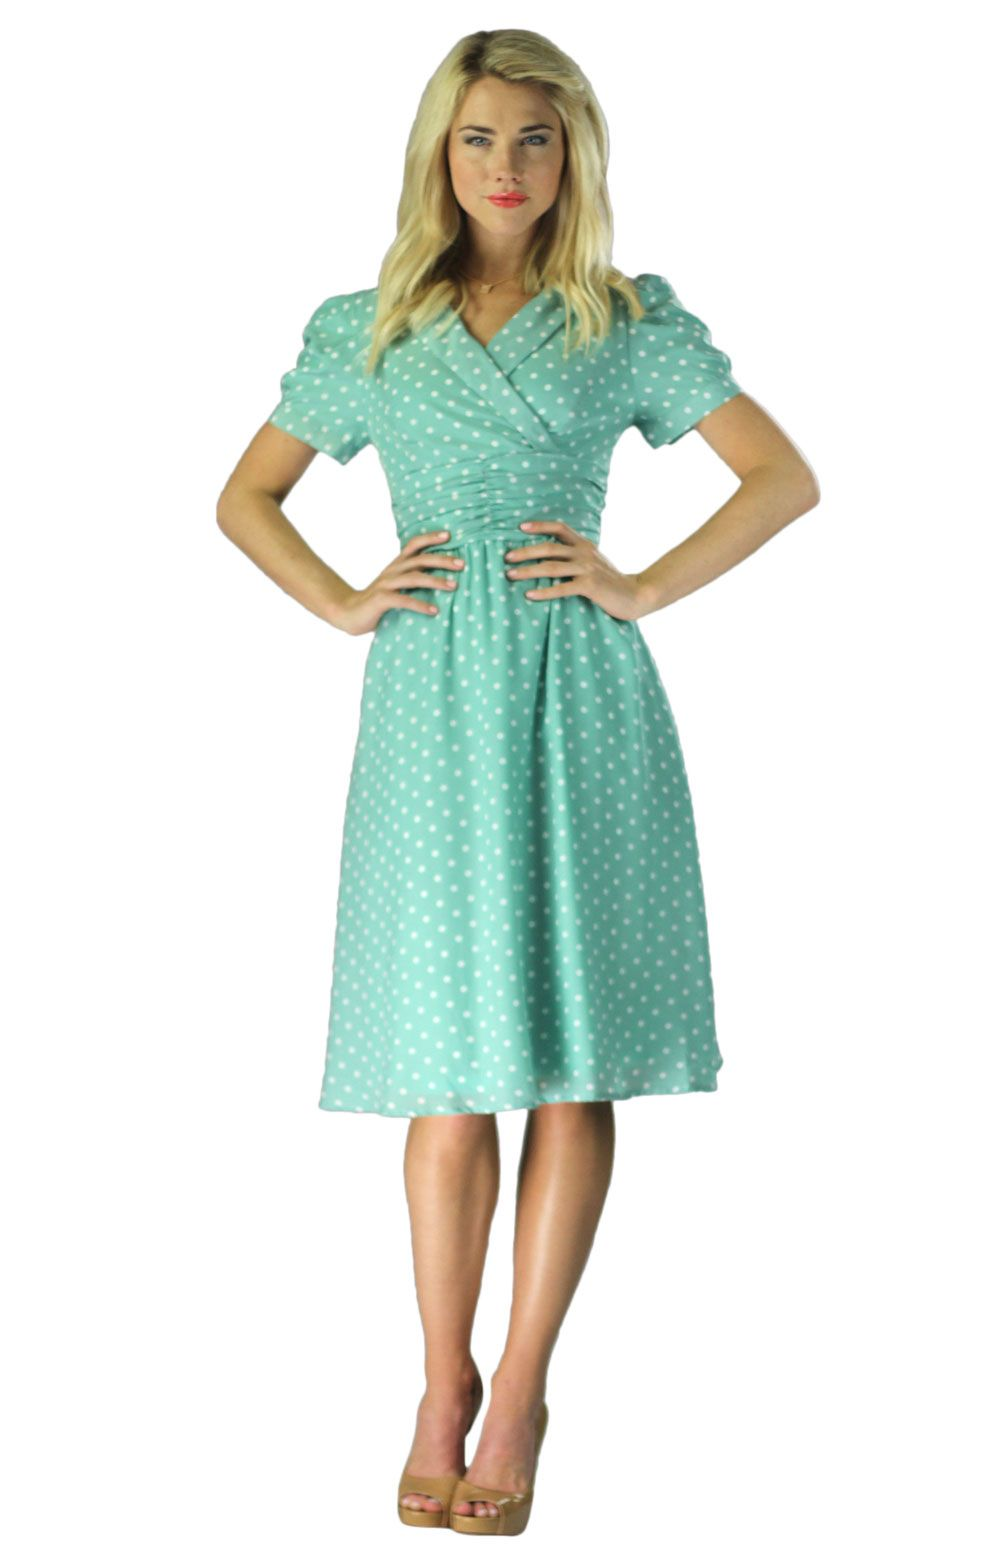 Vintage Modest Dresses in Mint Polka Dot | Femdom Artist Reference ...